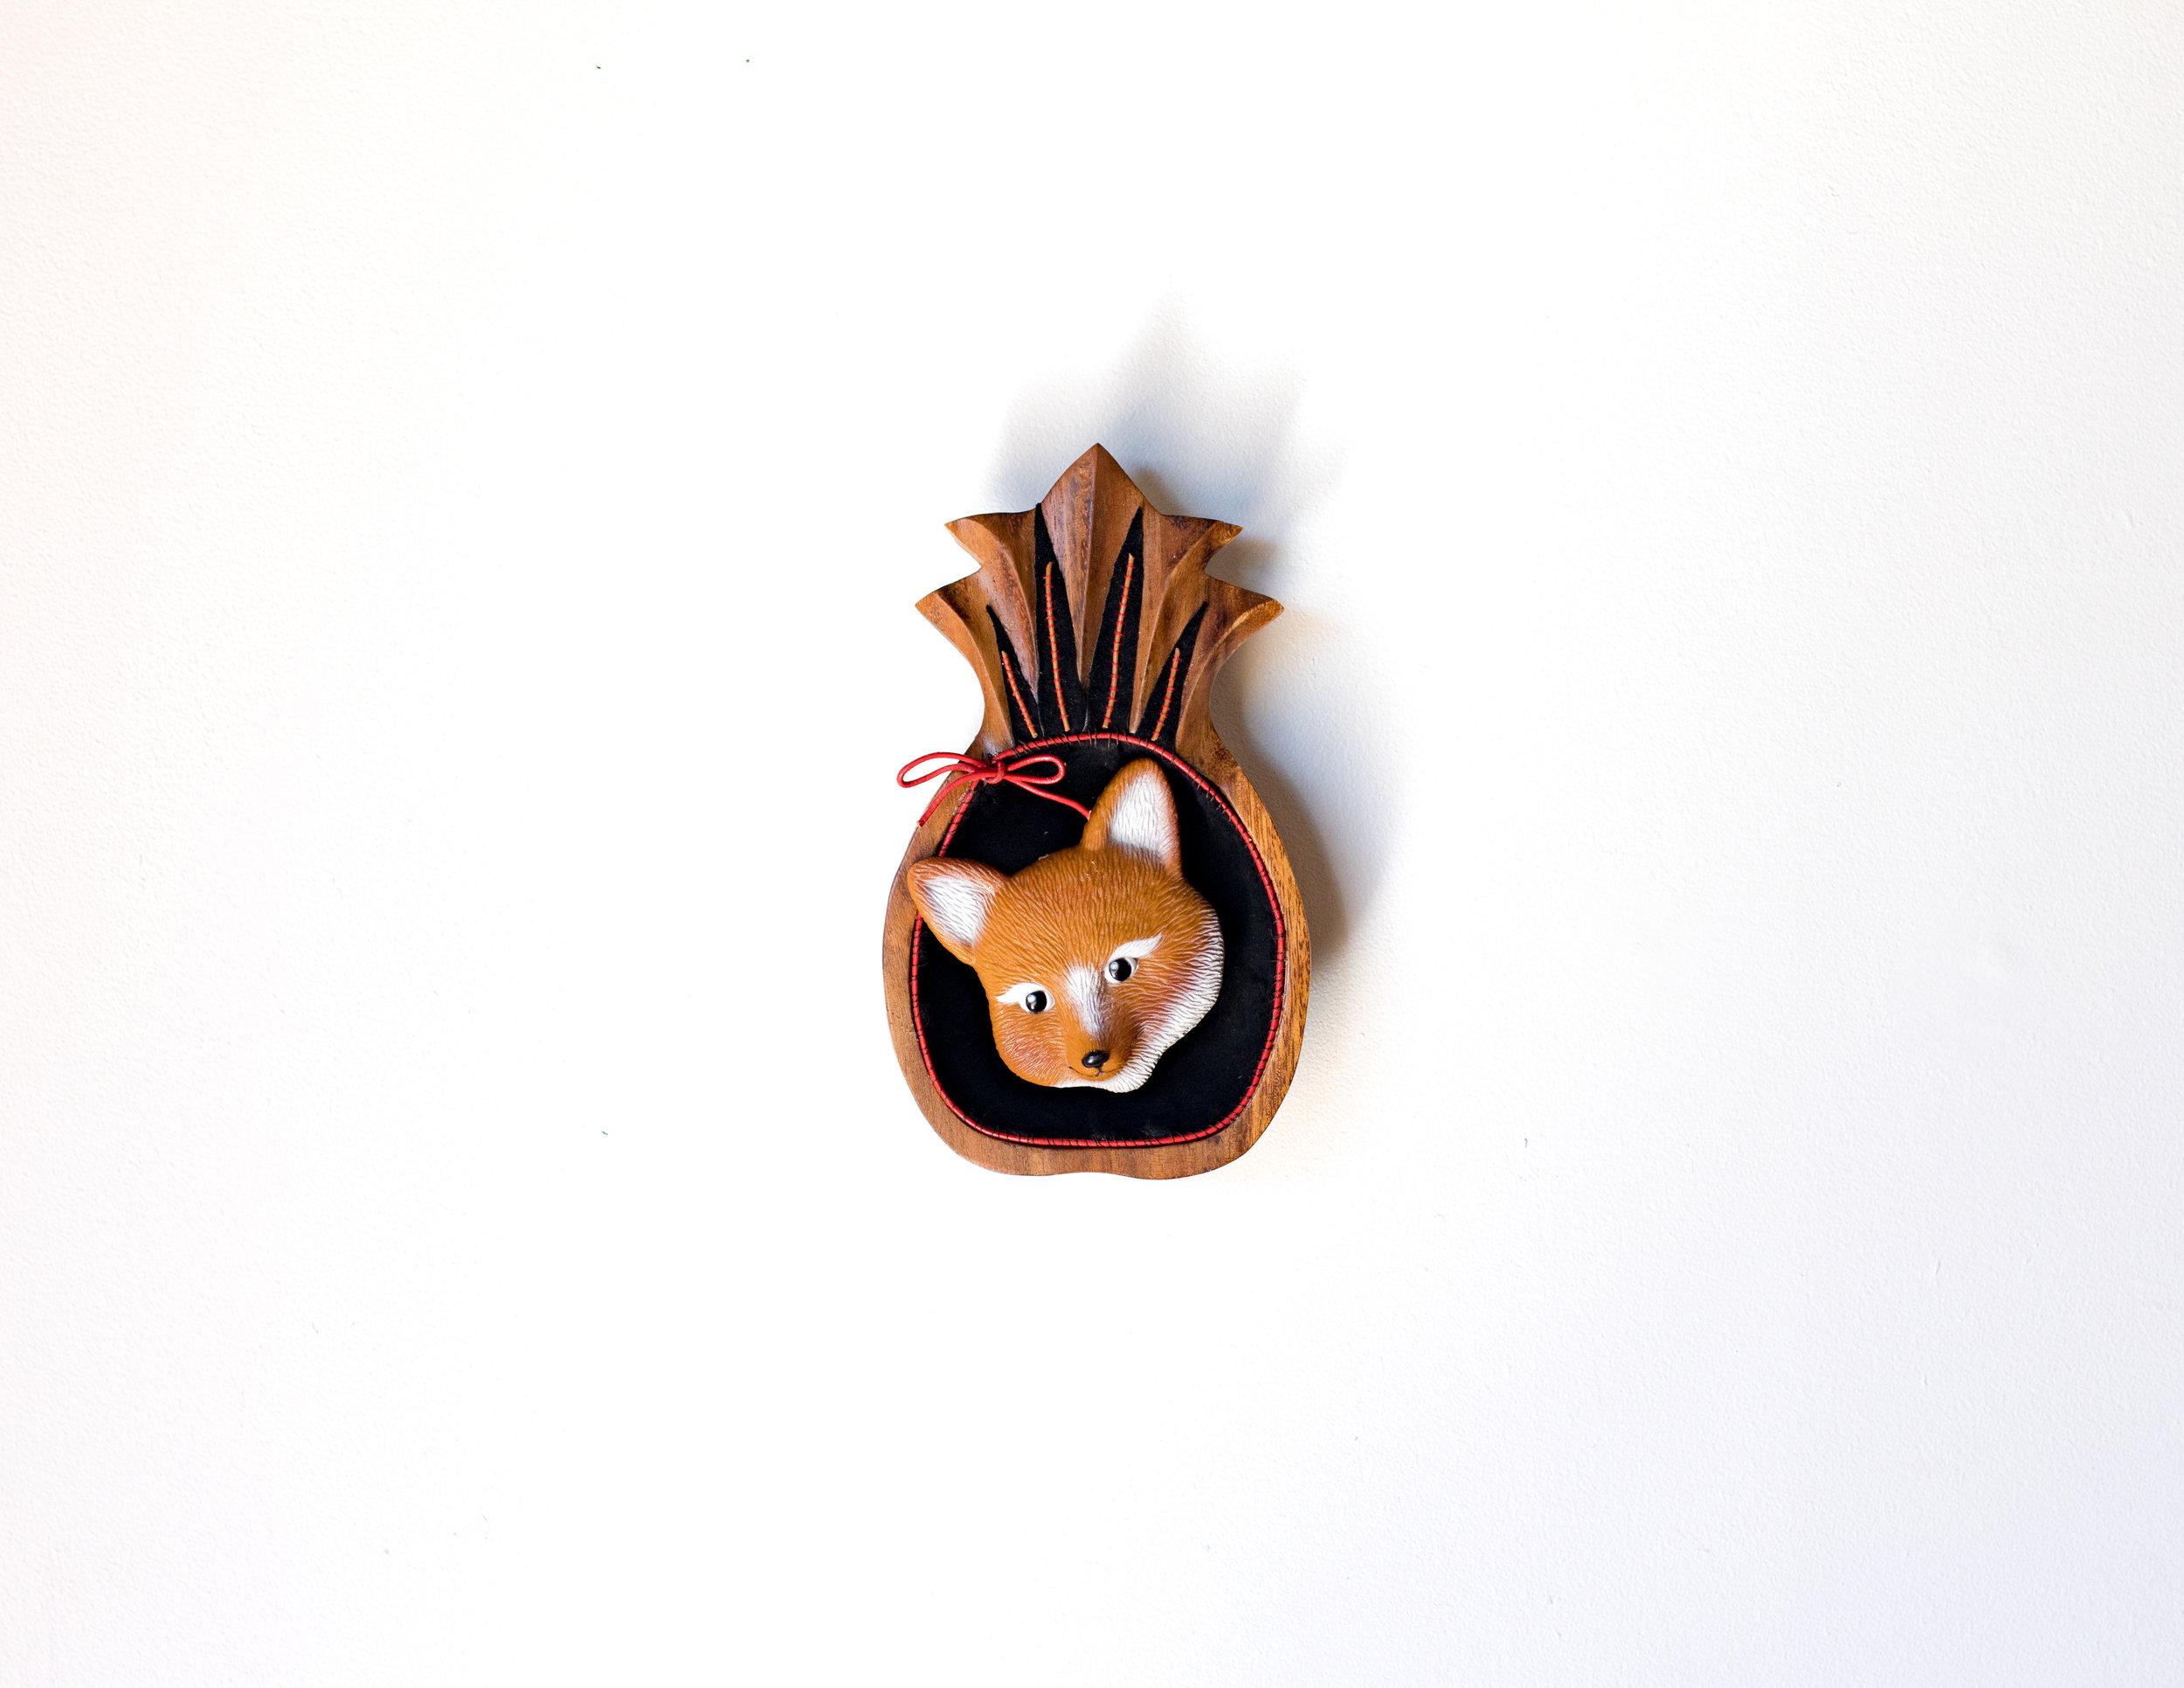 Beata Batorowicz _Pineapple Fox_ 2018, leather, suede, found object, leather thonging.jpg